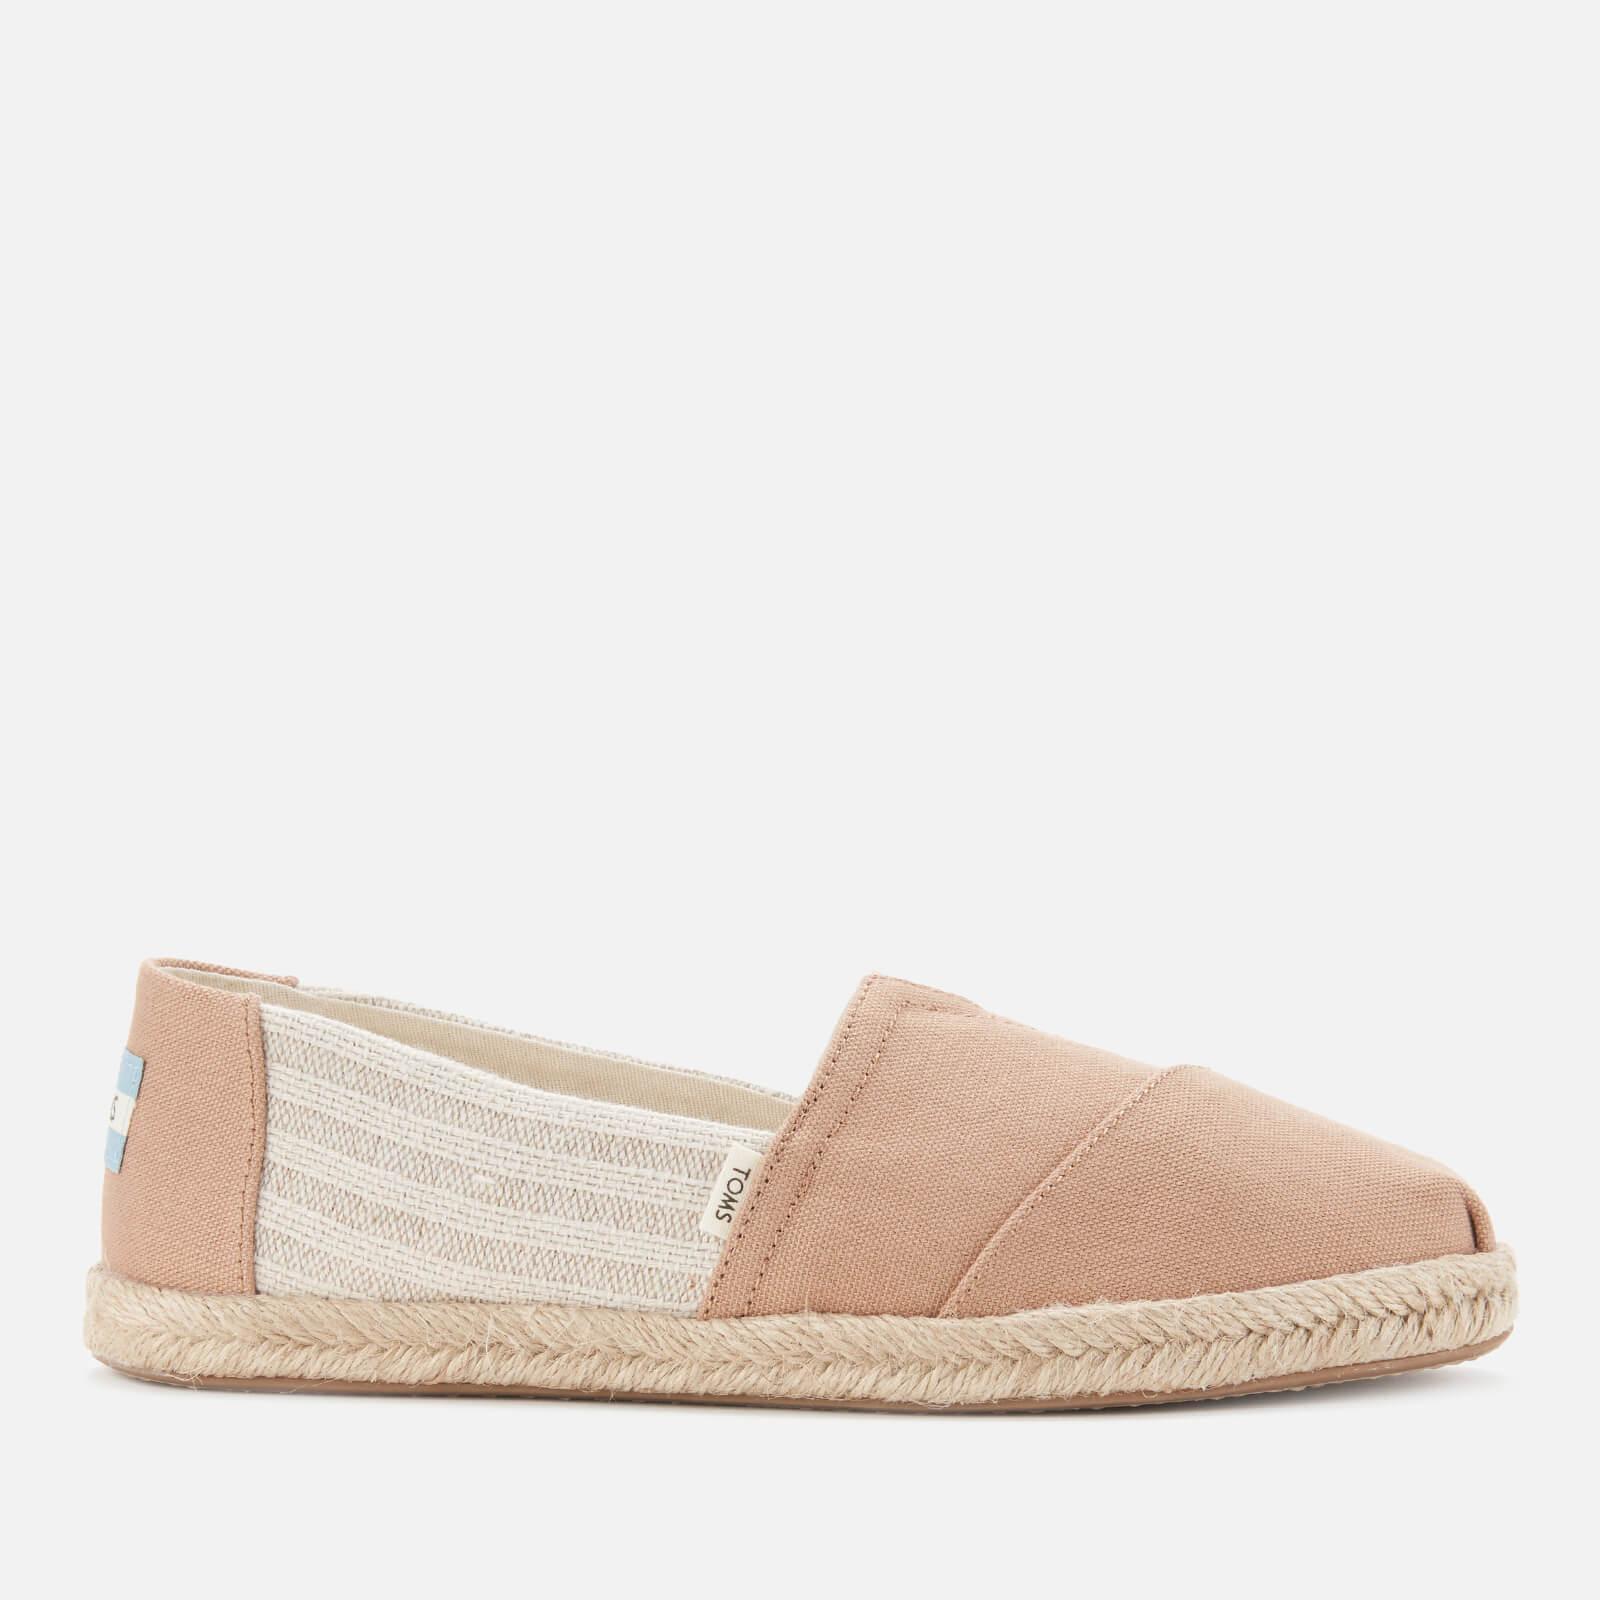 16f4916df99 TOMS Women s Alpargata Vegan University Slip-On Pumps - Honey Womens  Footwear